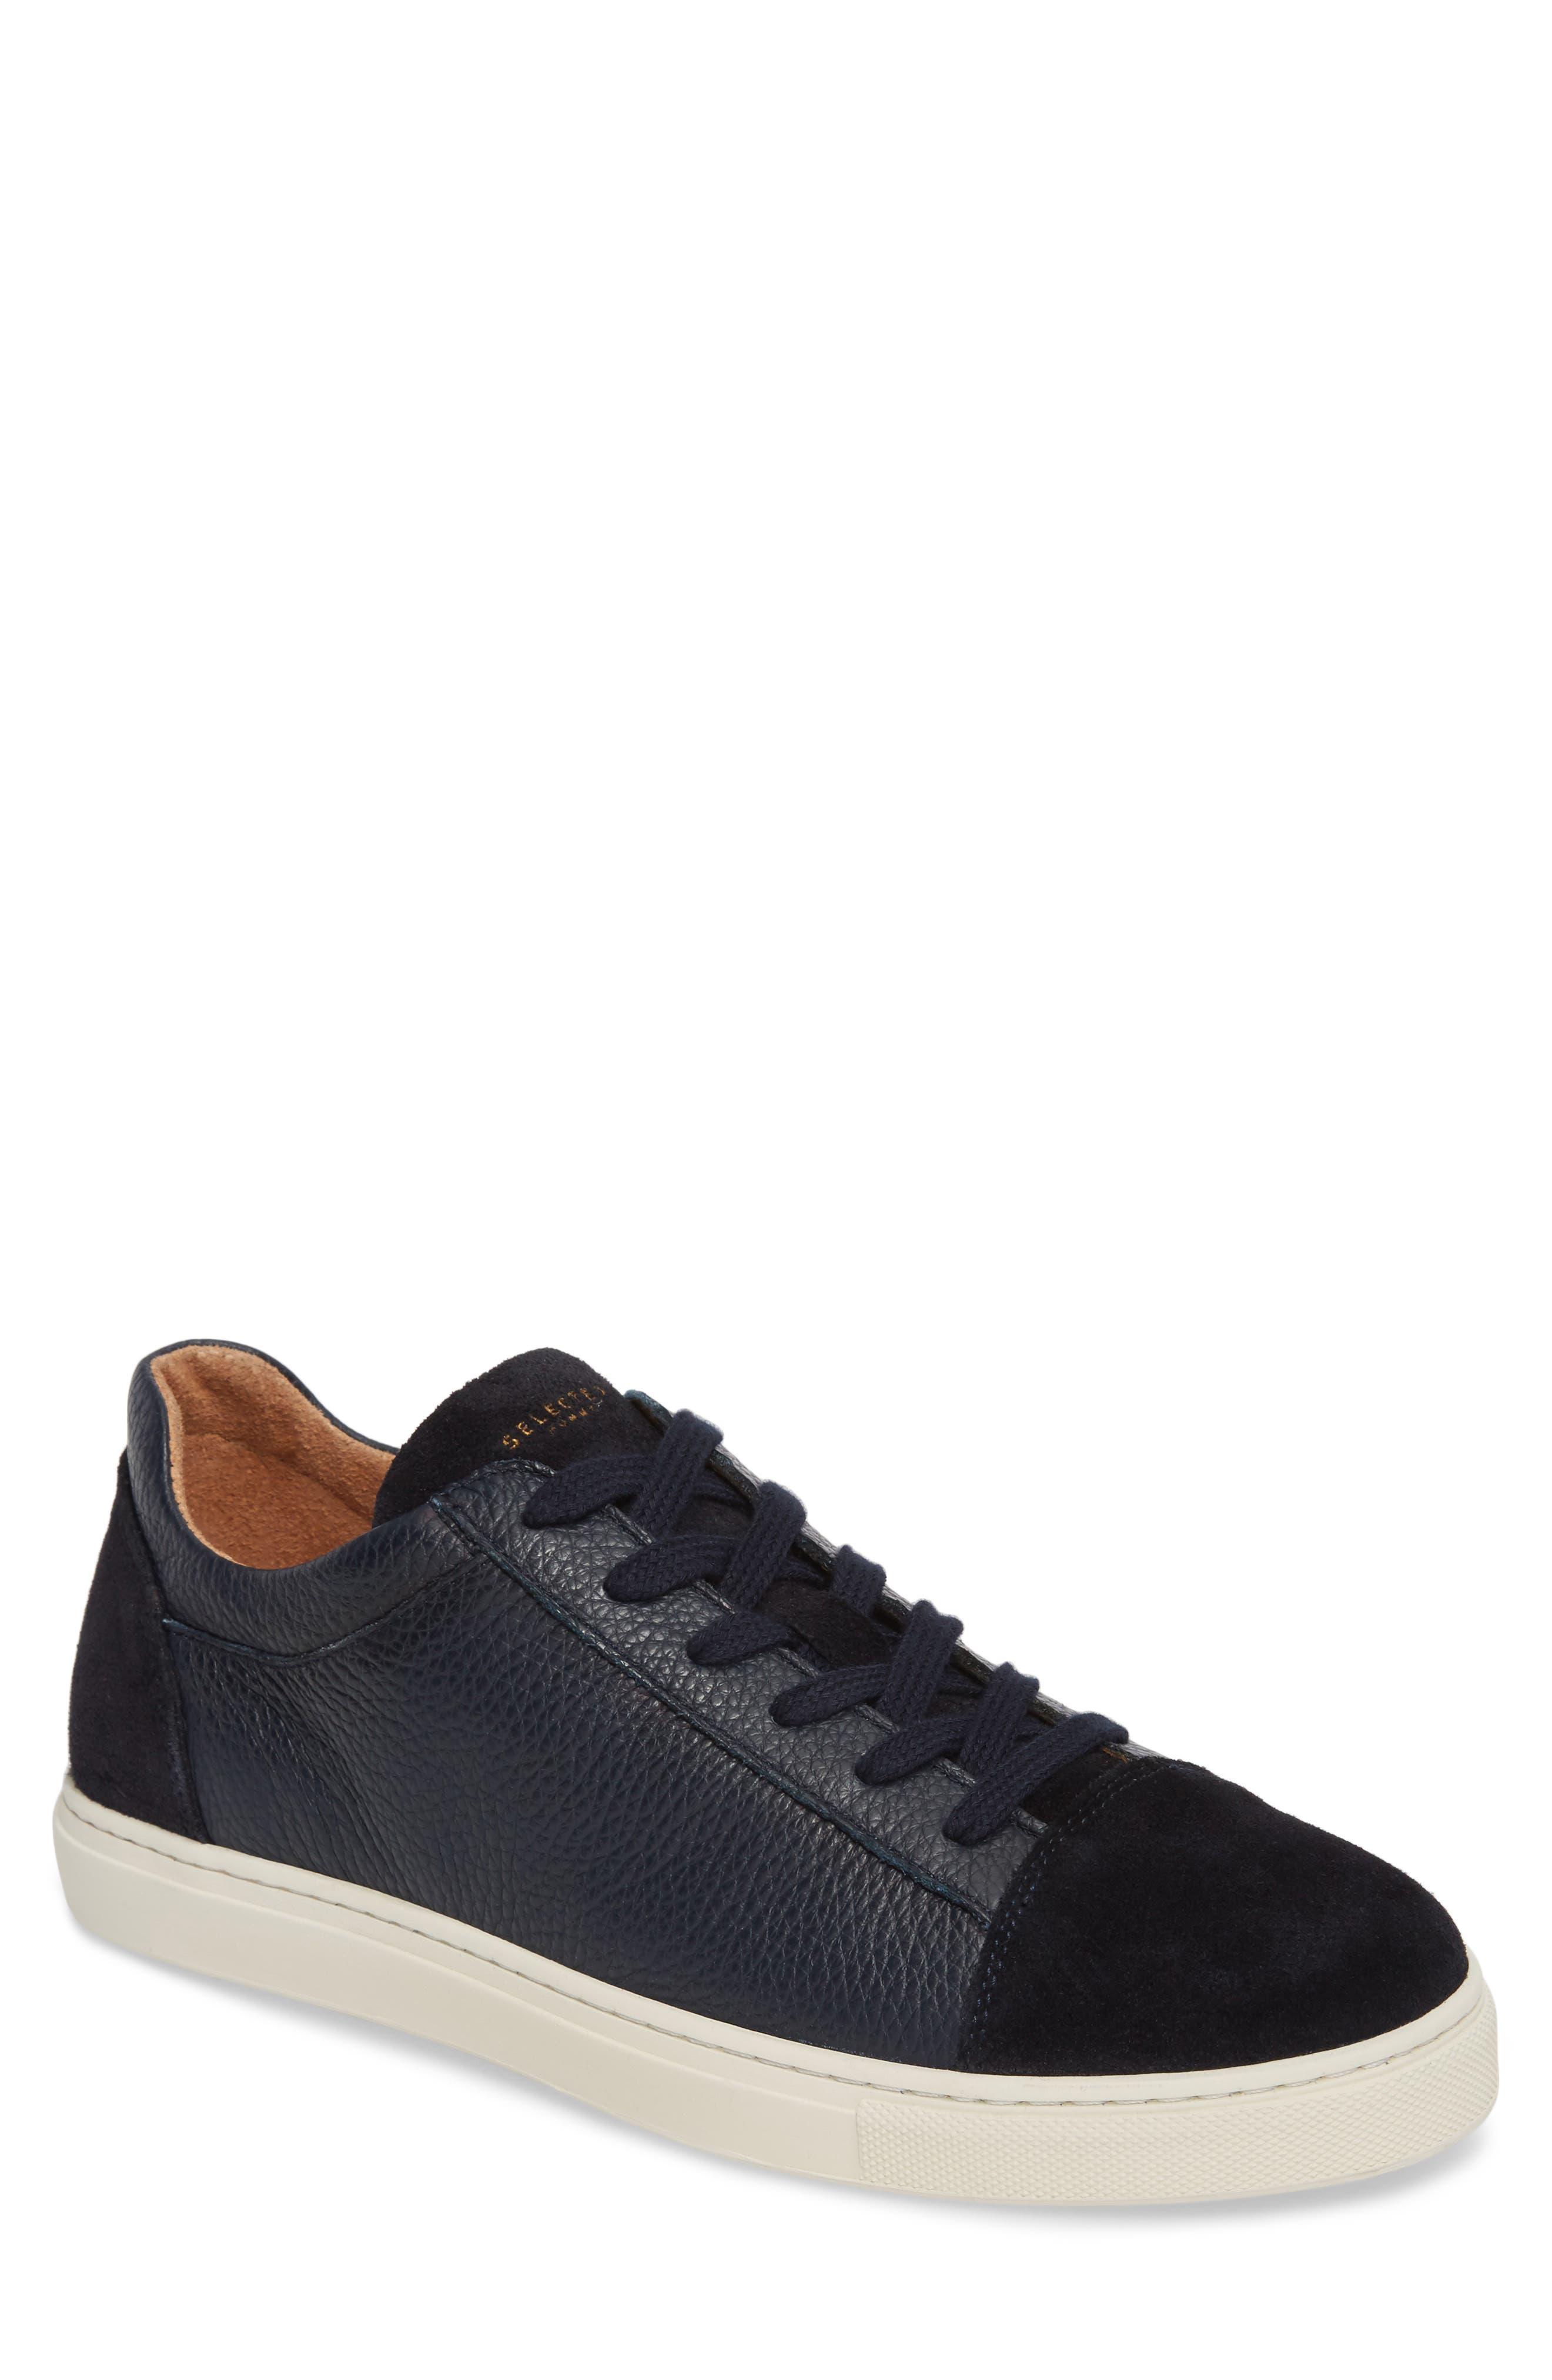 David Cap Toe Sneaker,                             Main thumbnail 1, color,                             Dark Navy Leather/ Suede